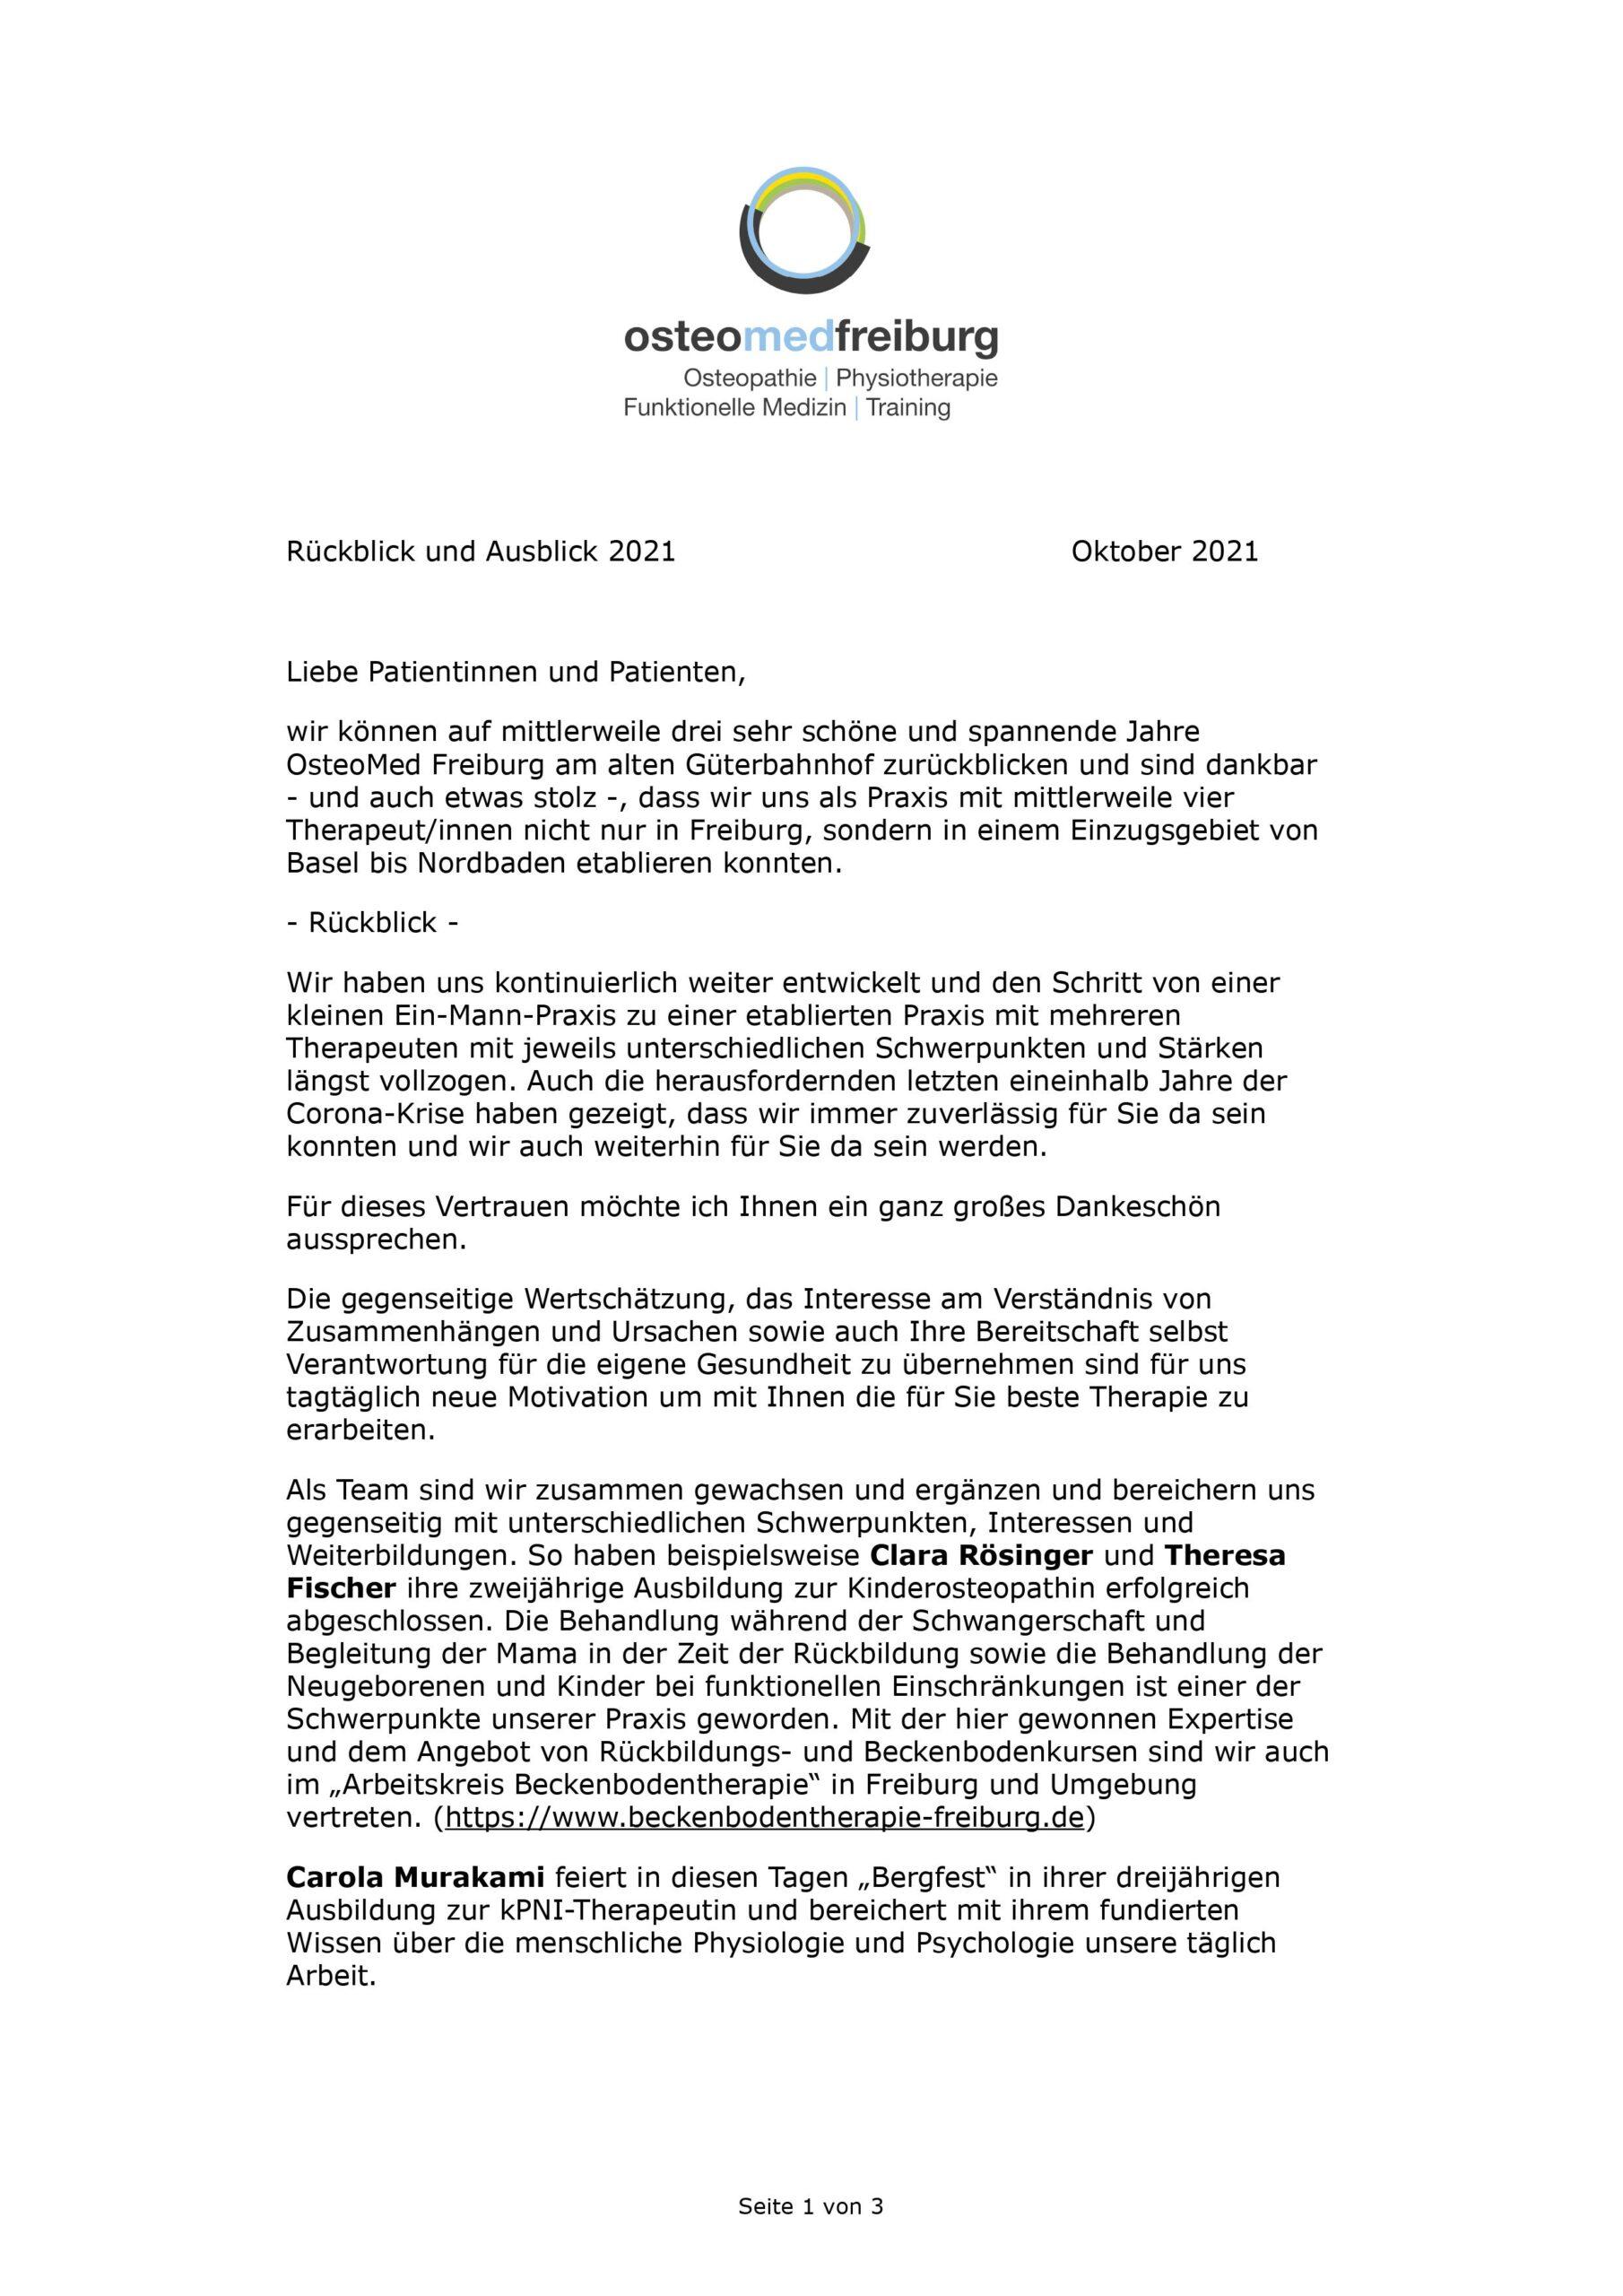 Rückblick - Ausblick - AGB 2021 1/3